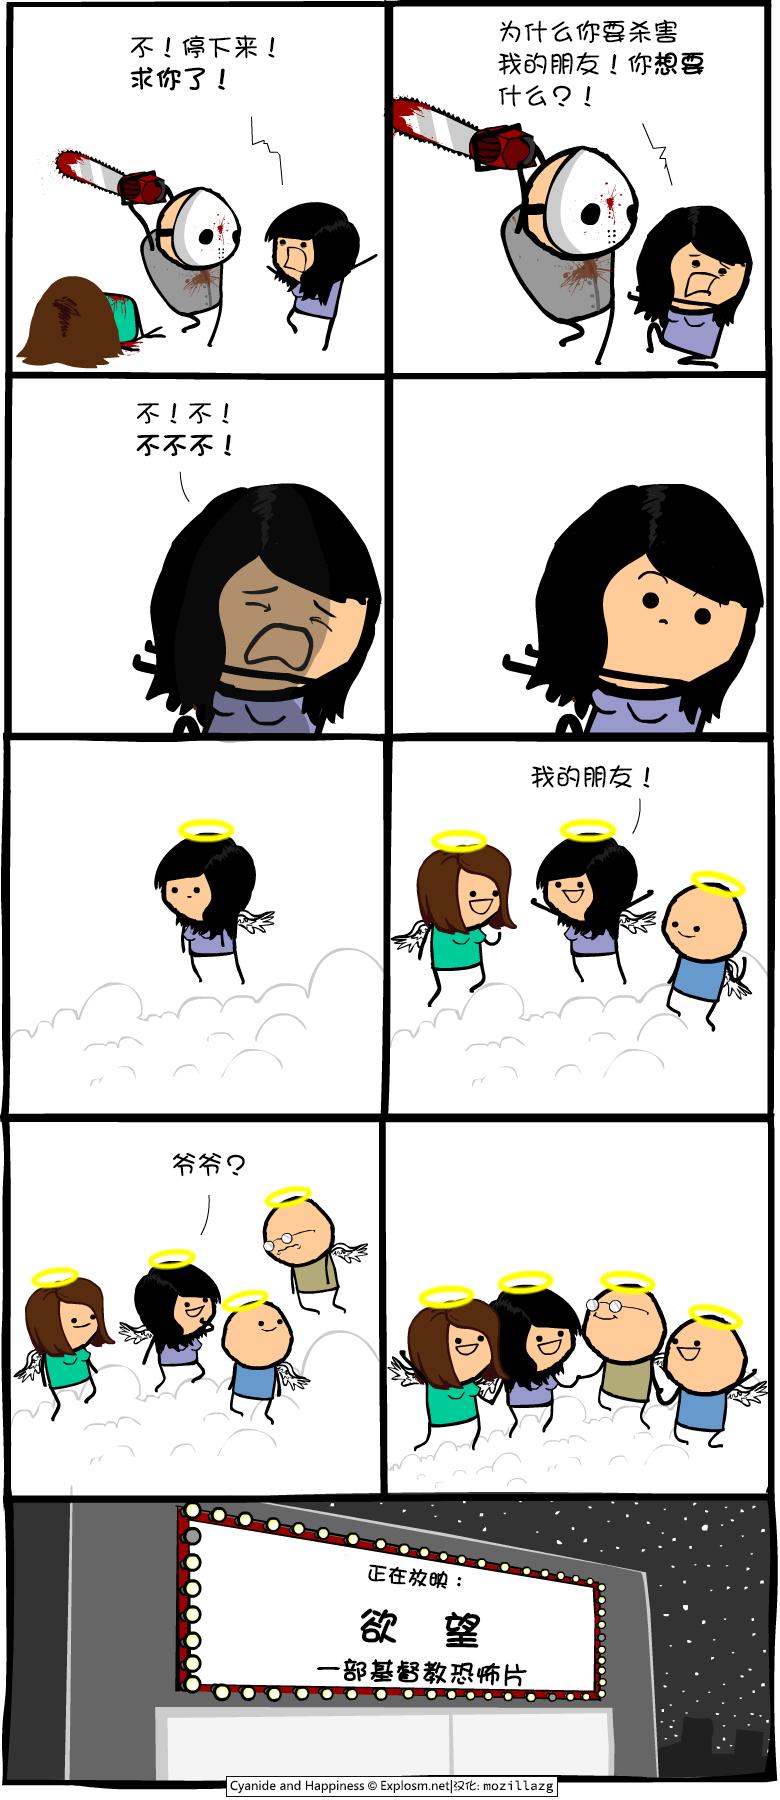 Cyanide & Happiness #4175:基督教电影